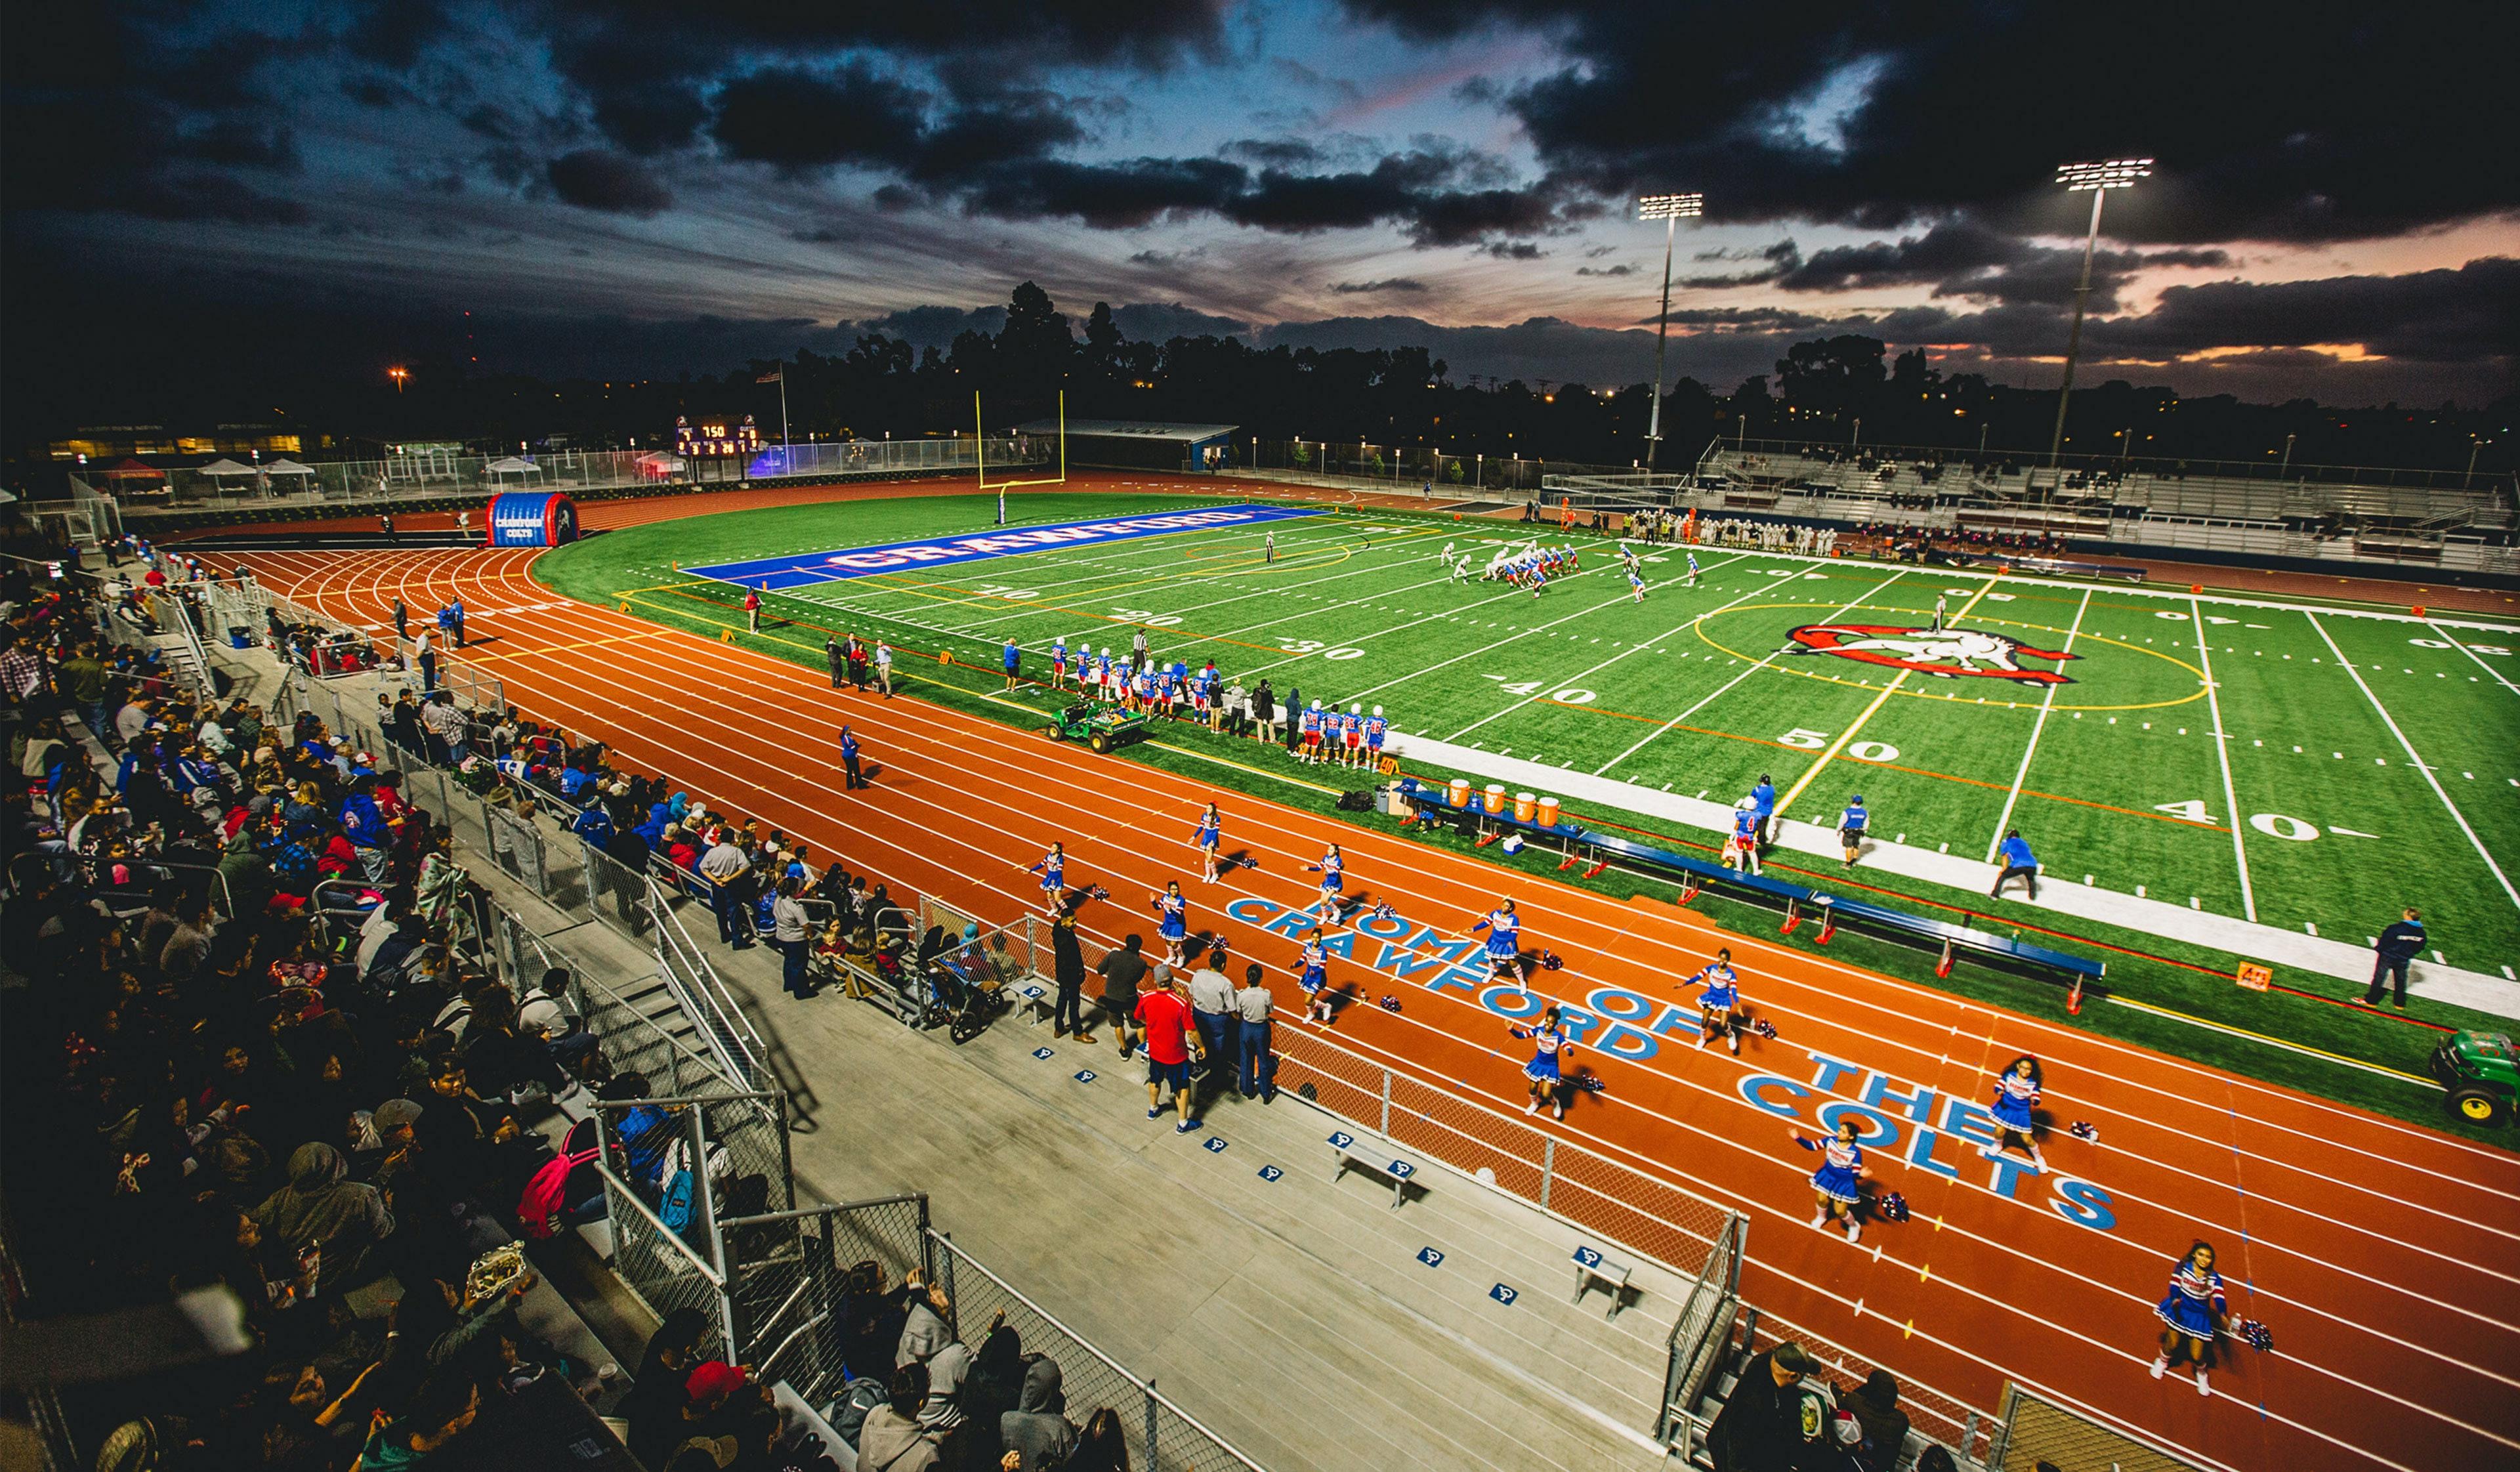 Crawford High School Stadium